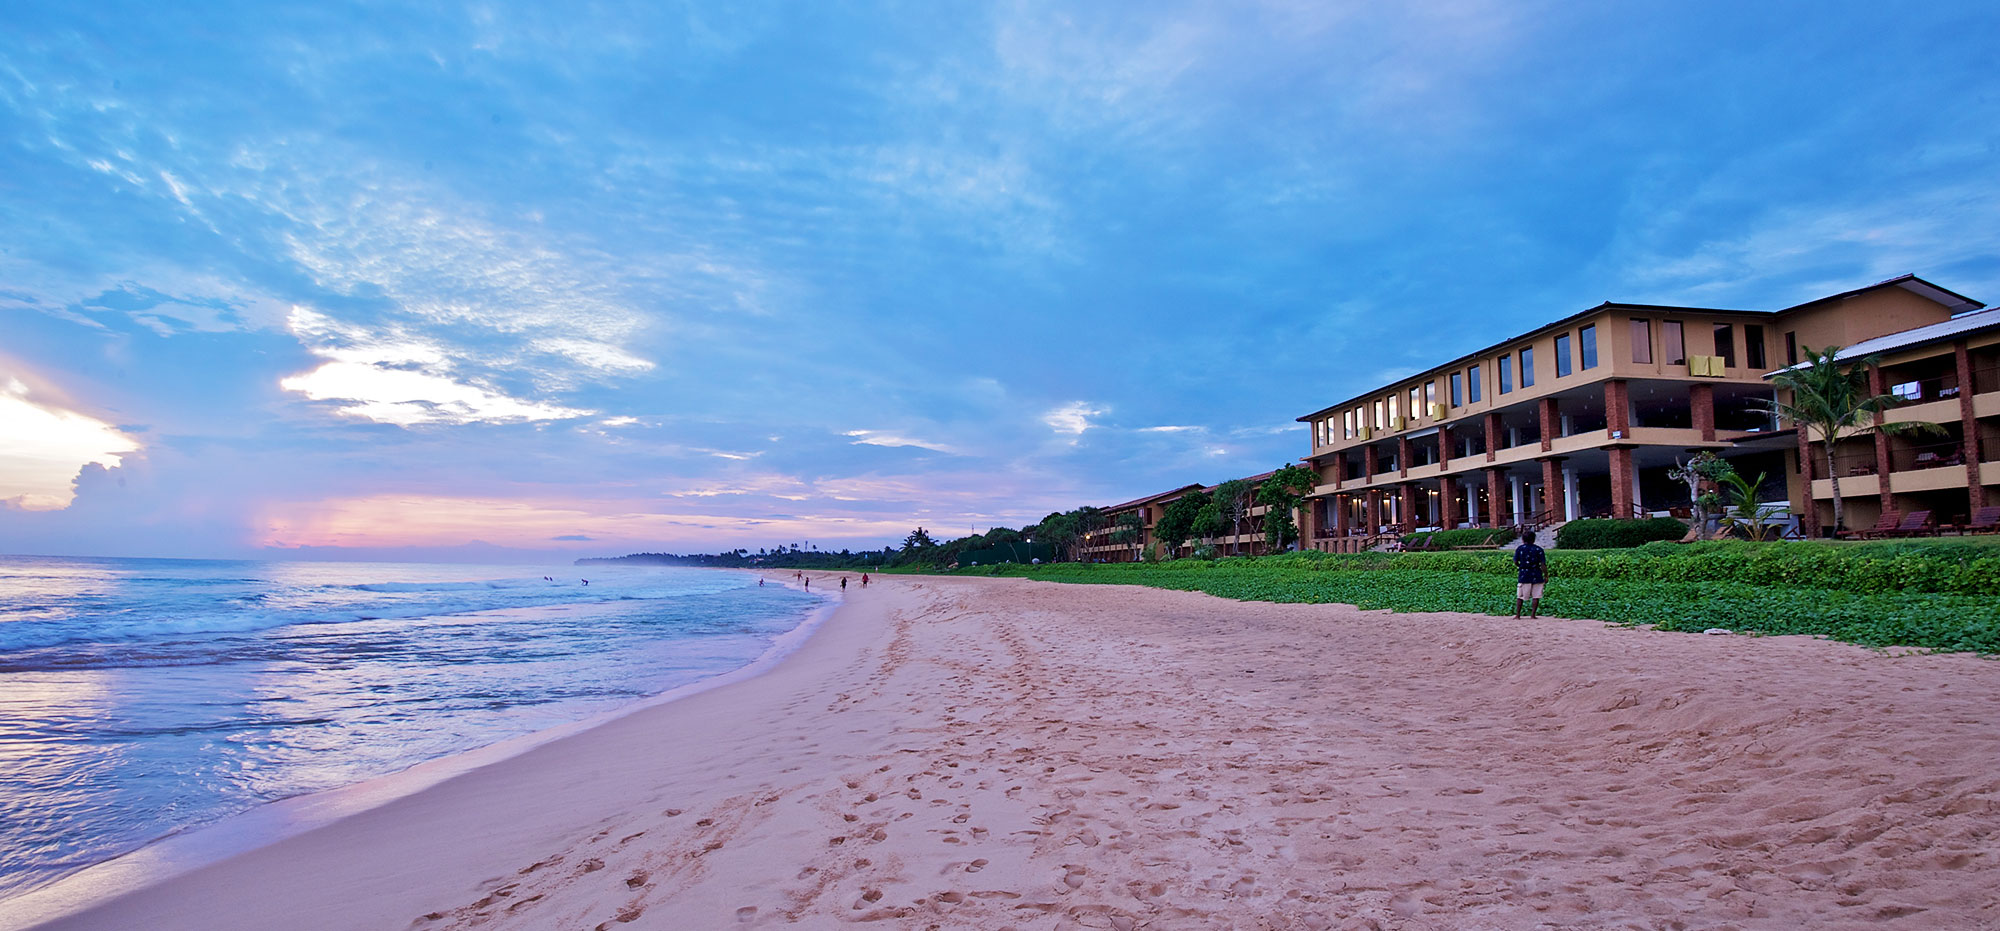 Photo Gallery of The Long Beach Resort in Koggala Sri Lanka